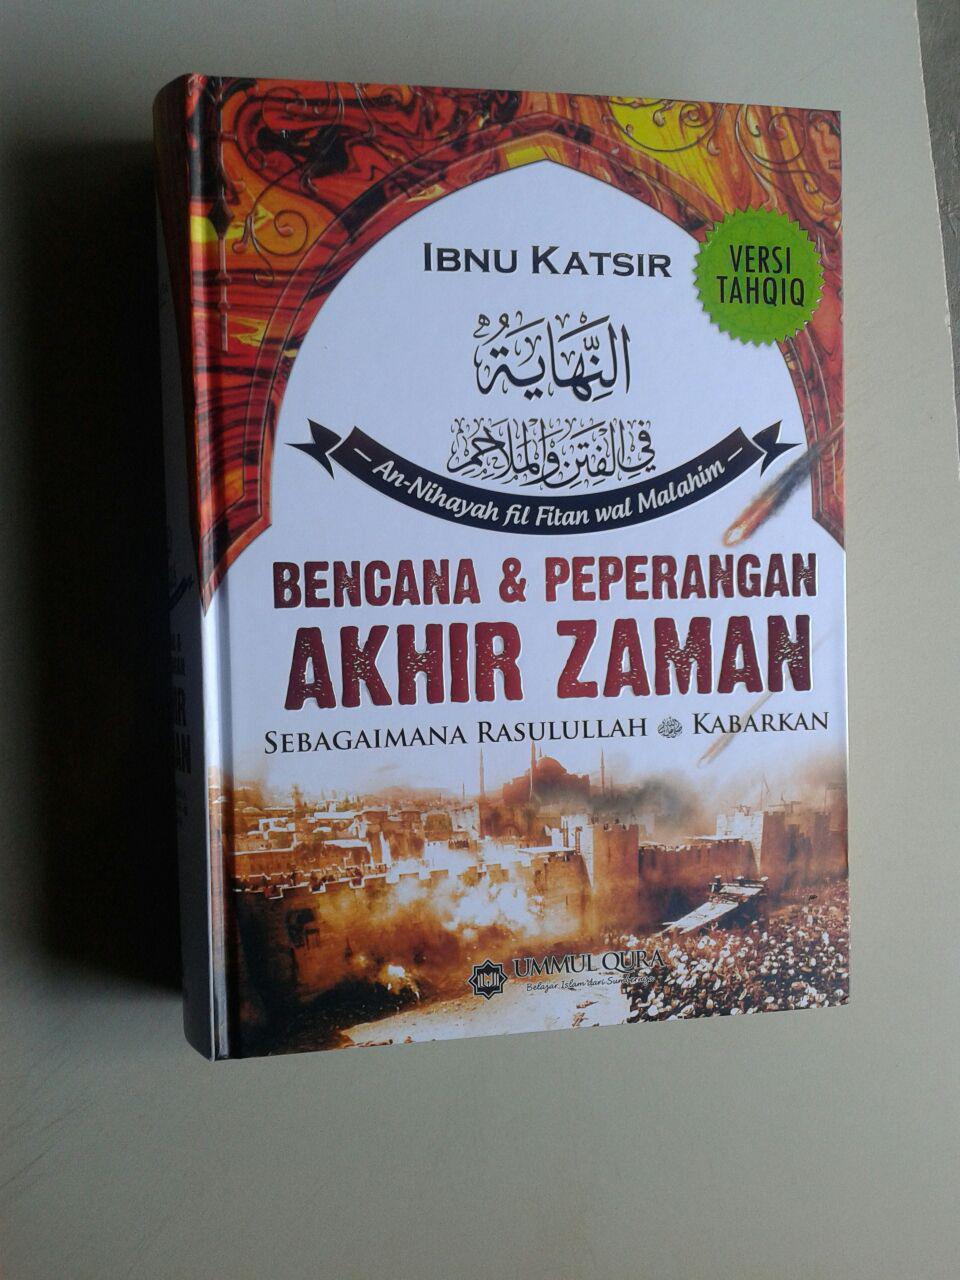 Buku Bencana & Peperangan Akhir Zaman Sebagaimana Rasulullah Kabarkan cover 2